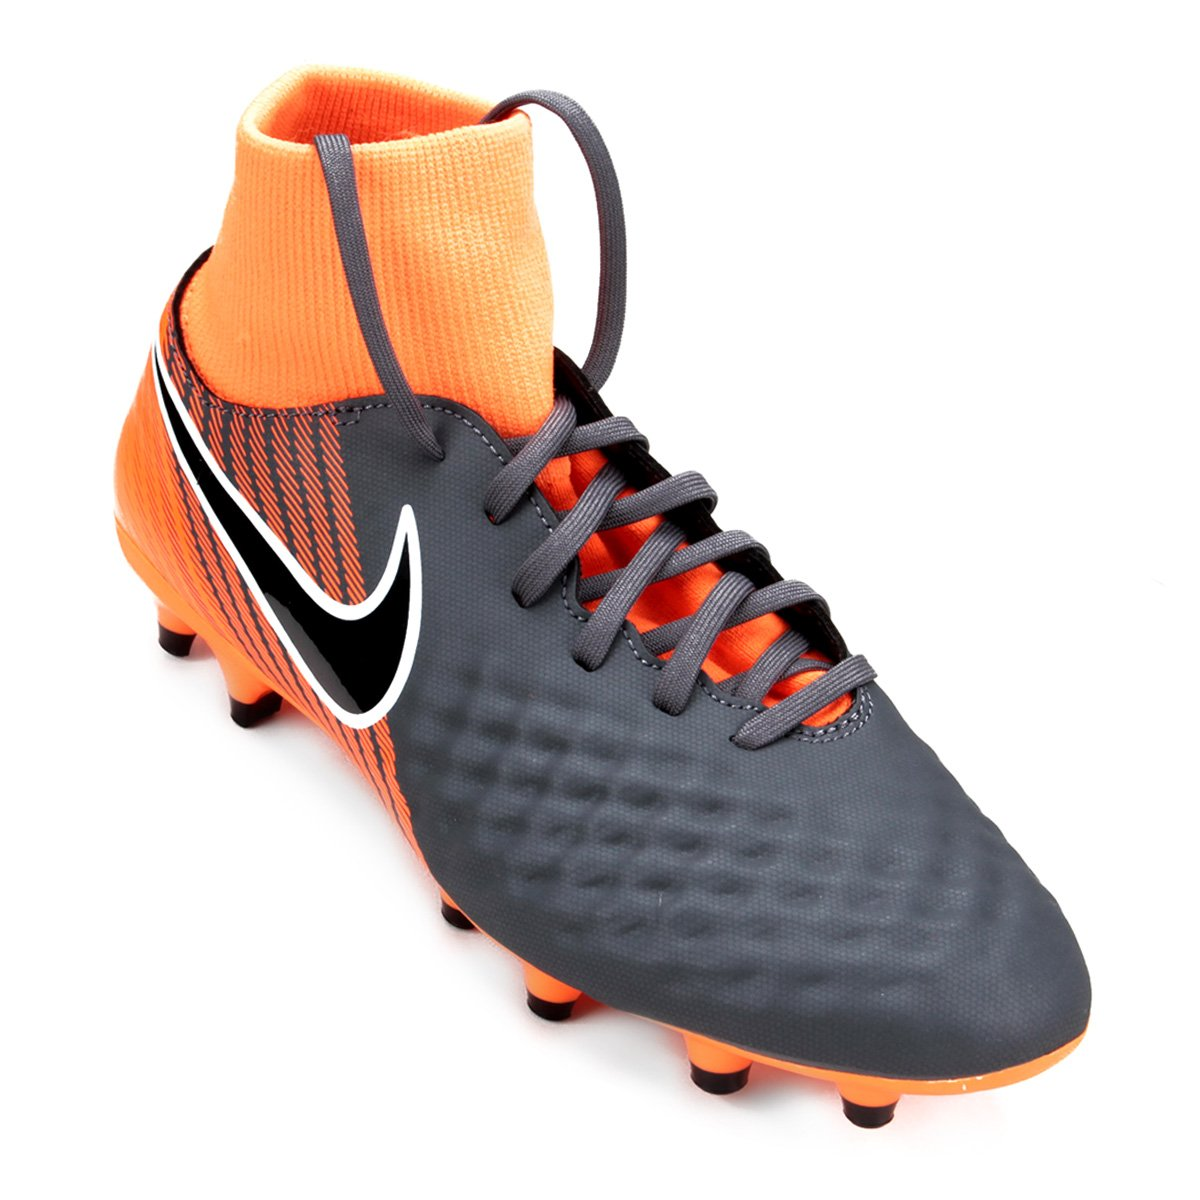 ... in stock Chuteira Campo Nike Magista Obra 2 Academy DF FG Masculina -  Cinza+Preto ... 4127ade219653